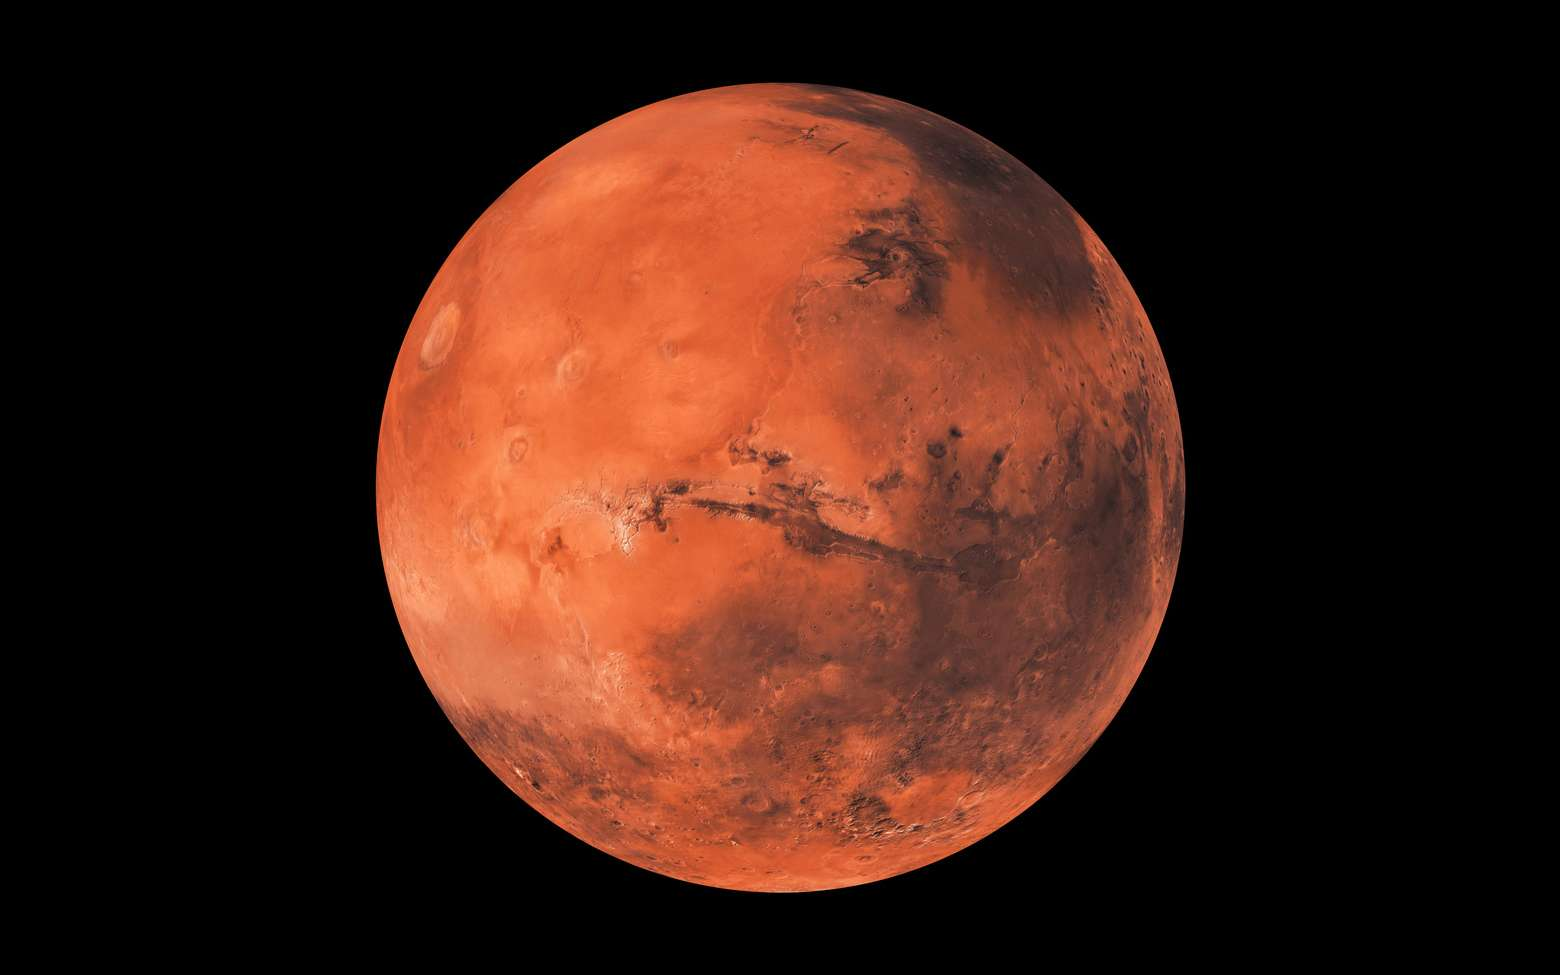 Y a-t-il de la vie sur Mars ? © Martin, fotolia